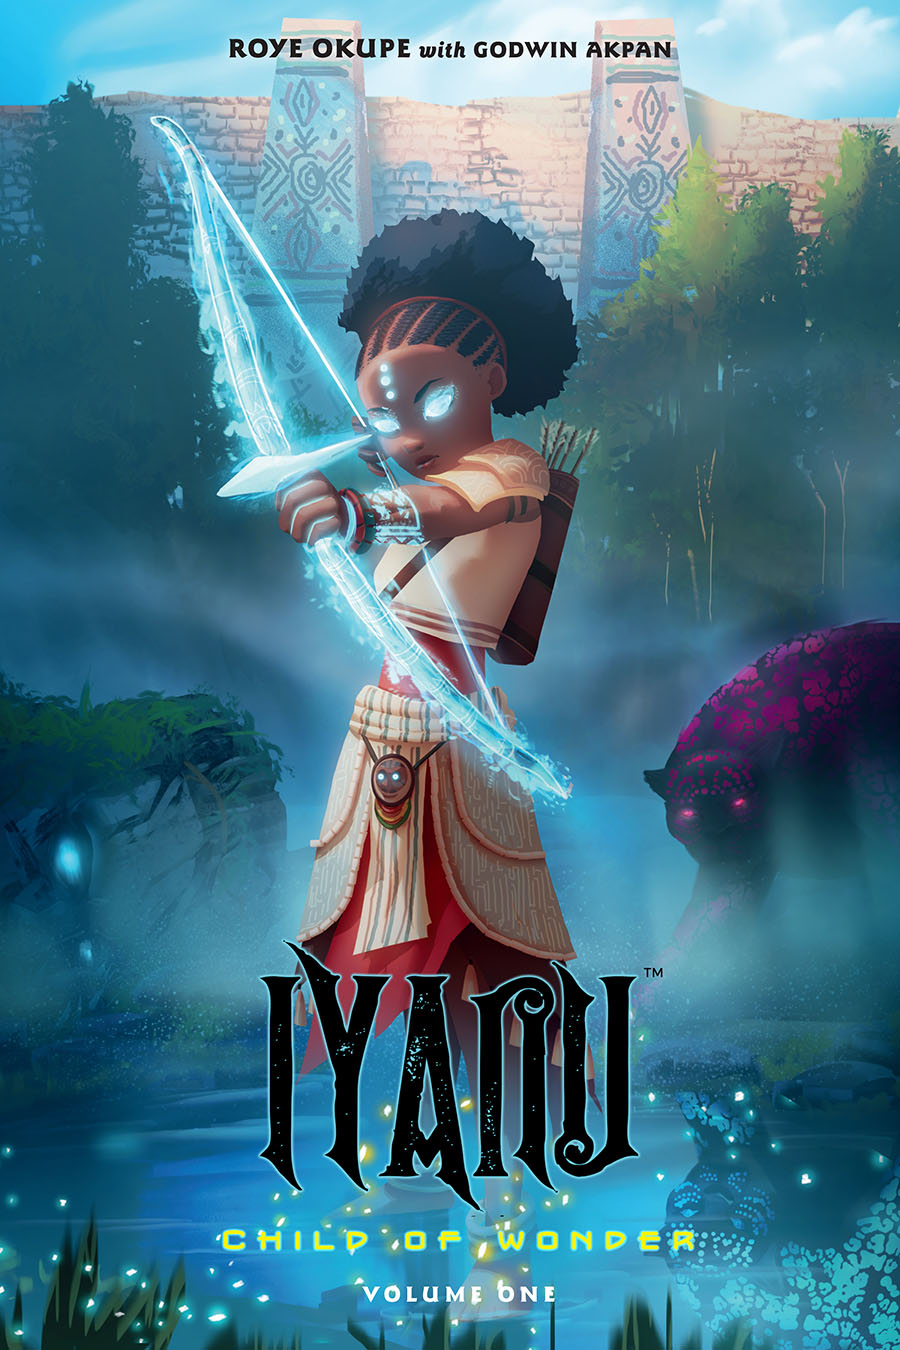 Iyanu Child of Wonder Cover